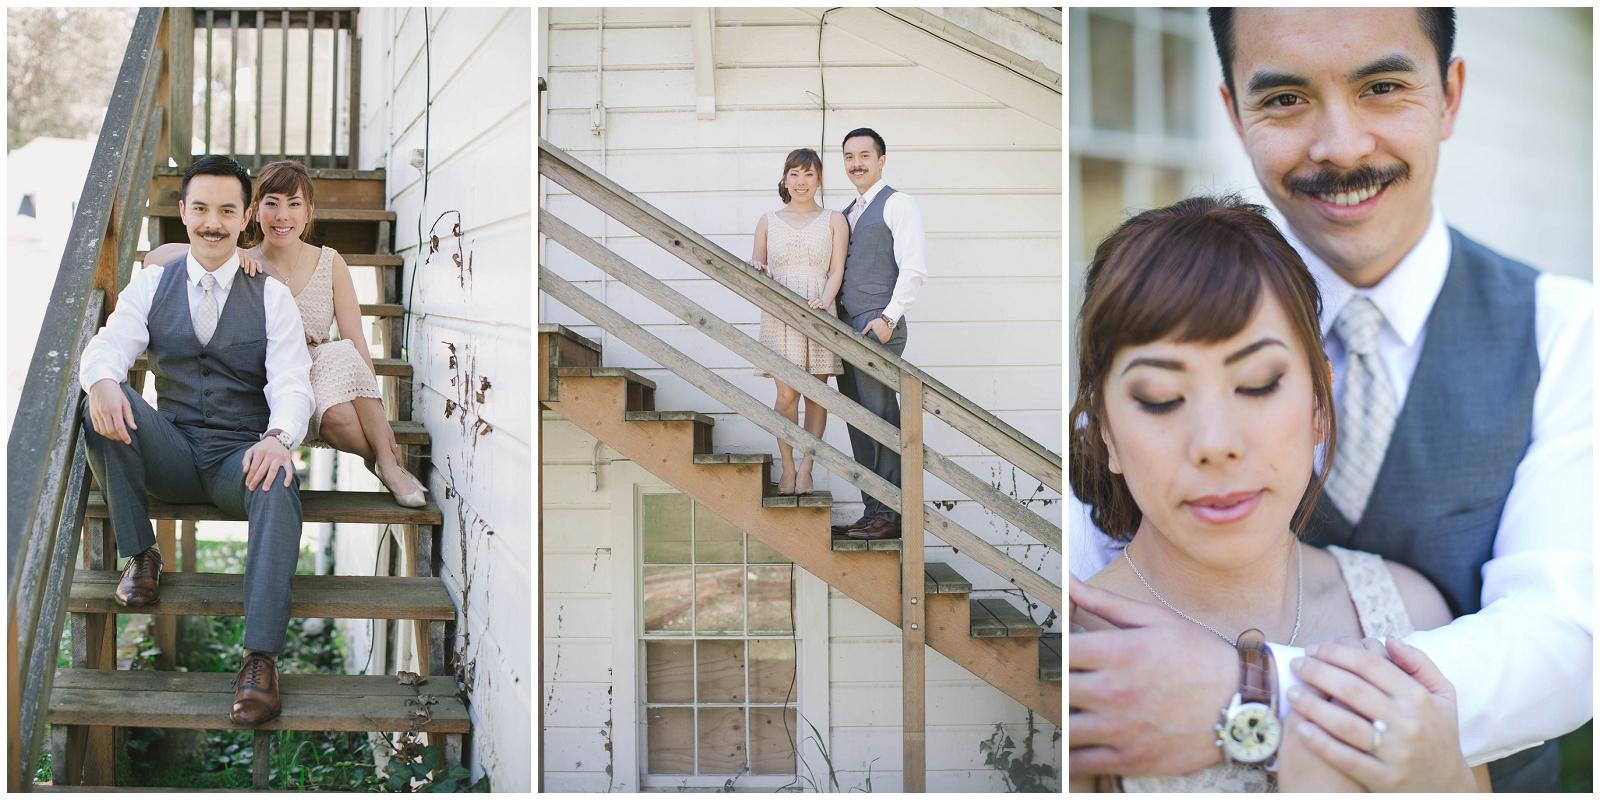 San-Francisco-Bay-Area-Wedding-Photography-Engagement-Treasure-Island-3.jpg